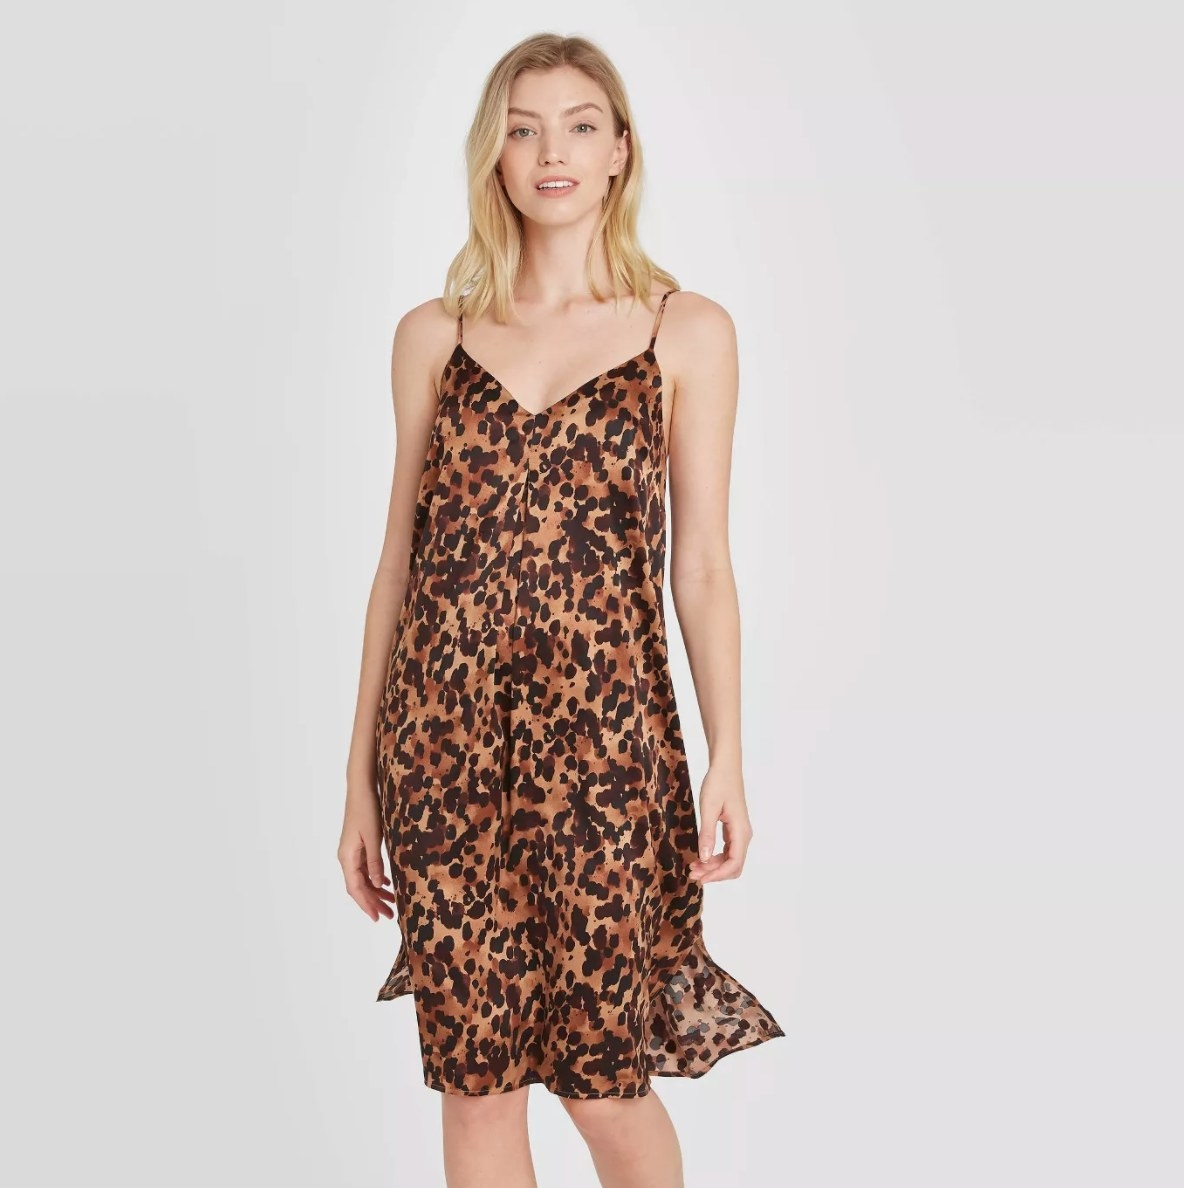 Model wearing the tortoise-print satin nightgown